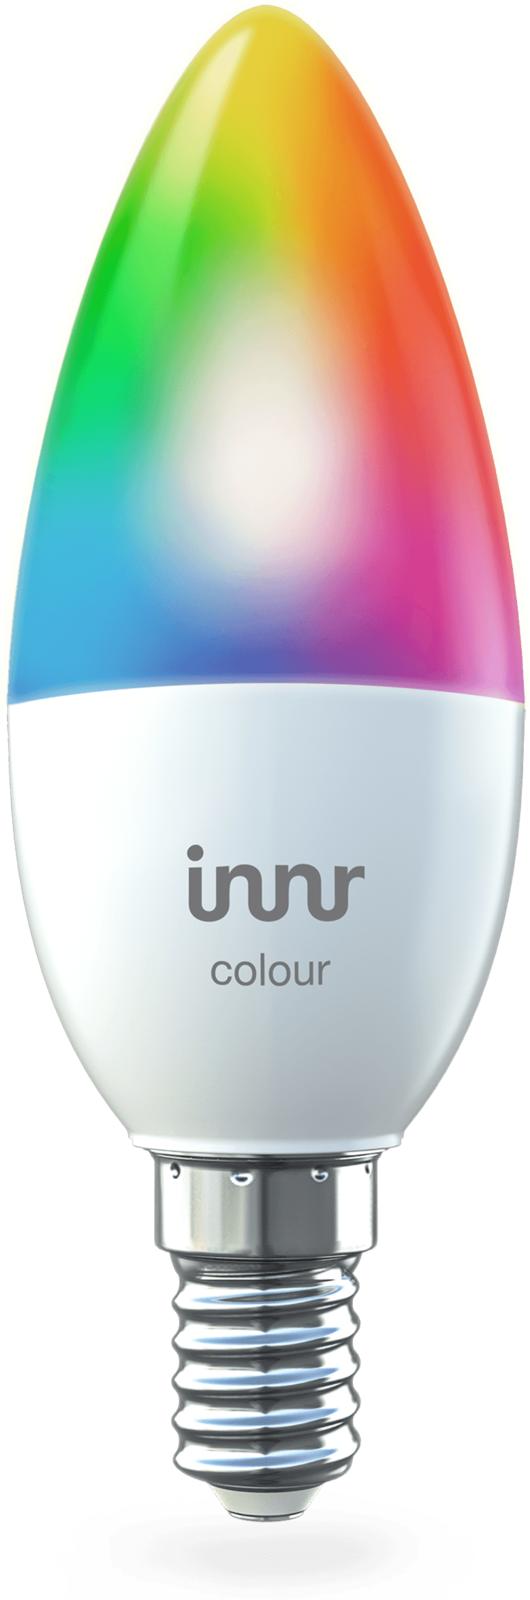 INNR Lighting 1x E14 smart LED lamp Color - RGBW/CCT, 470lm RB 250 C - eet01